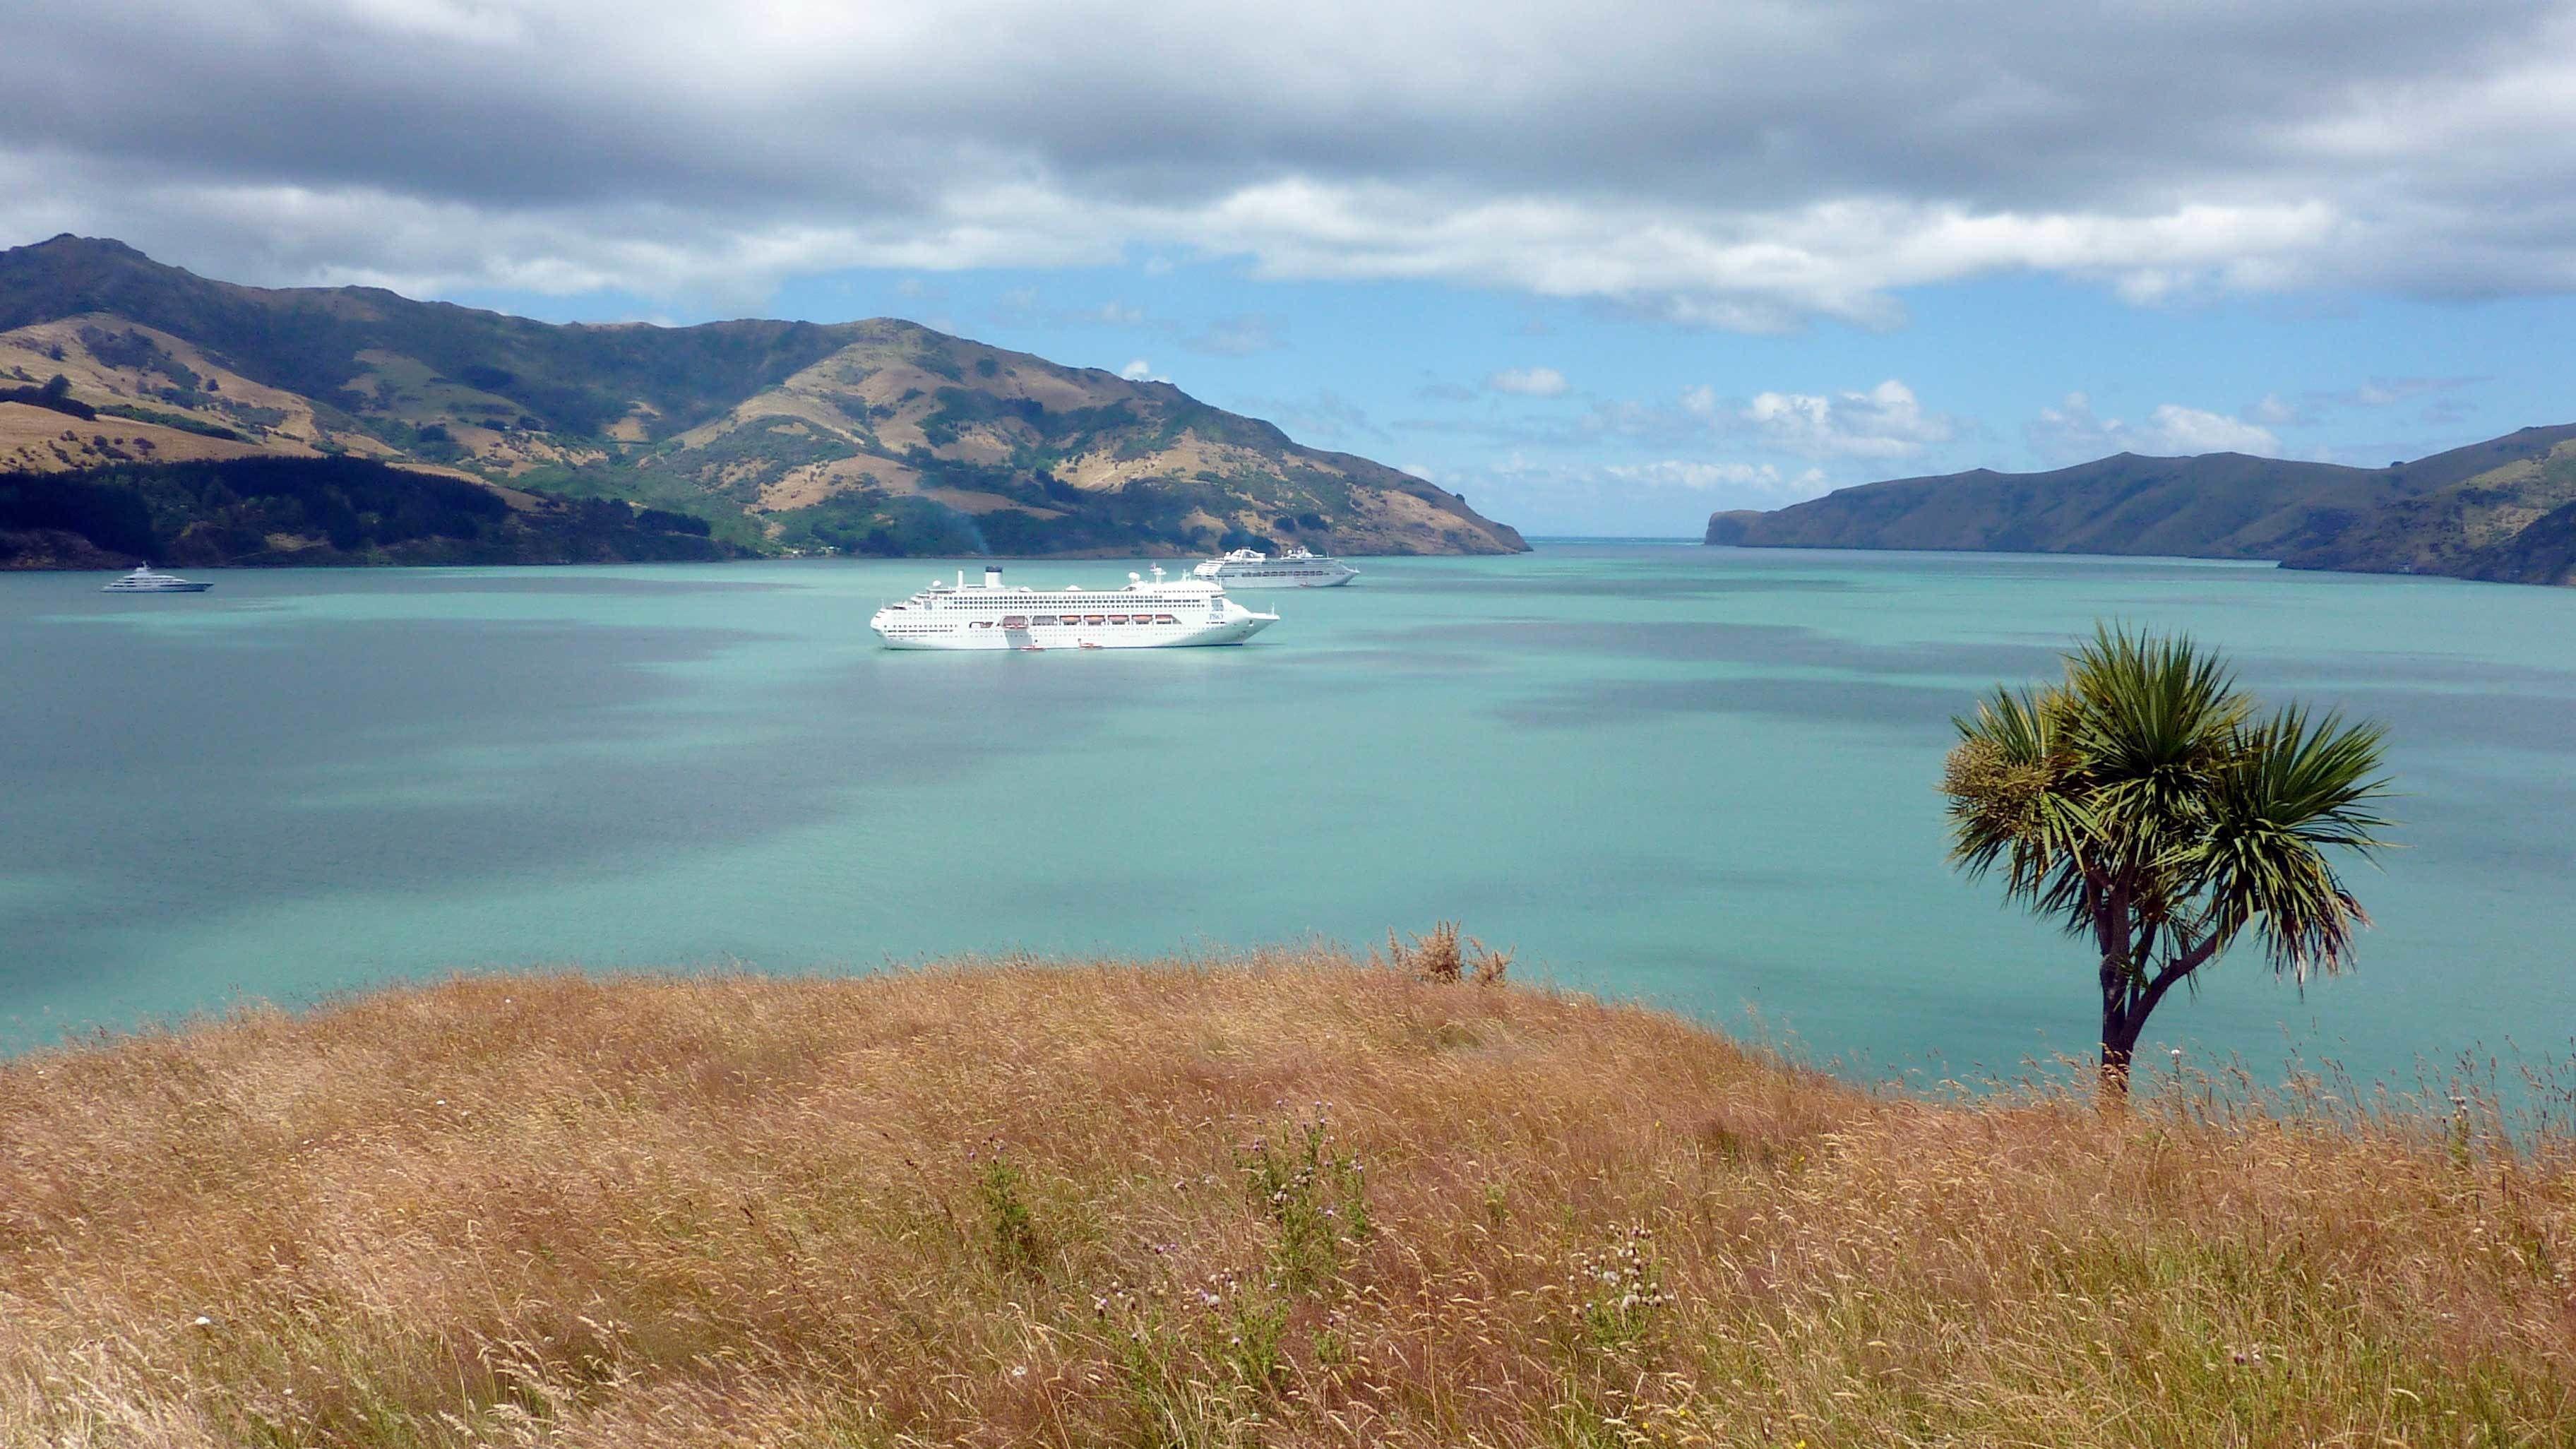 Akaroa Cruise Excursion – Christchurch City Sightseeing & Farm Tour